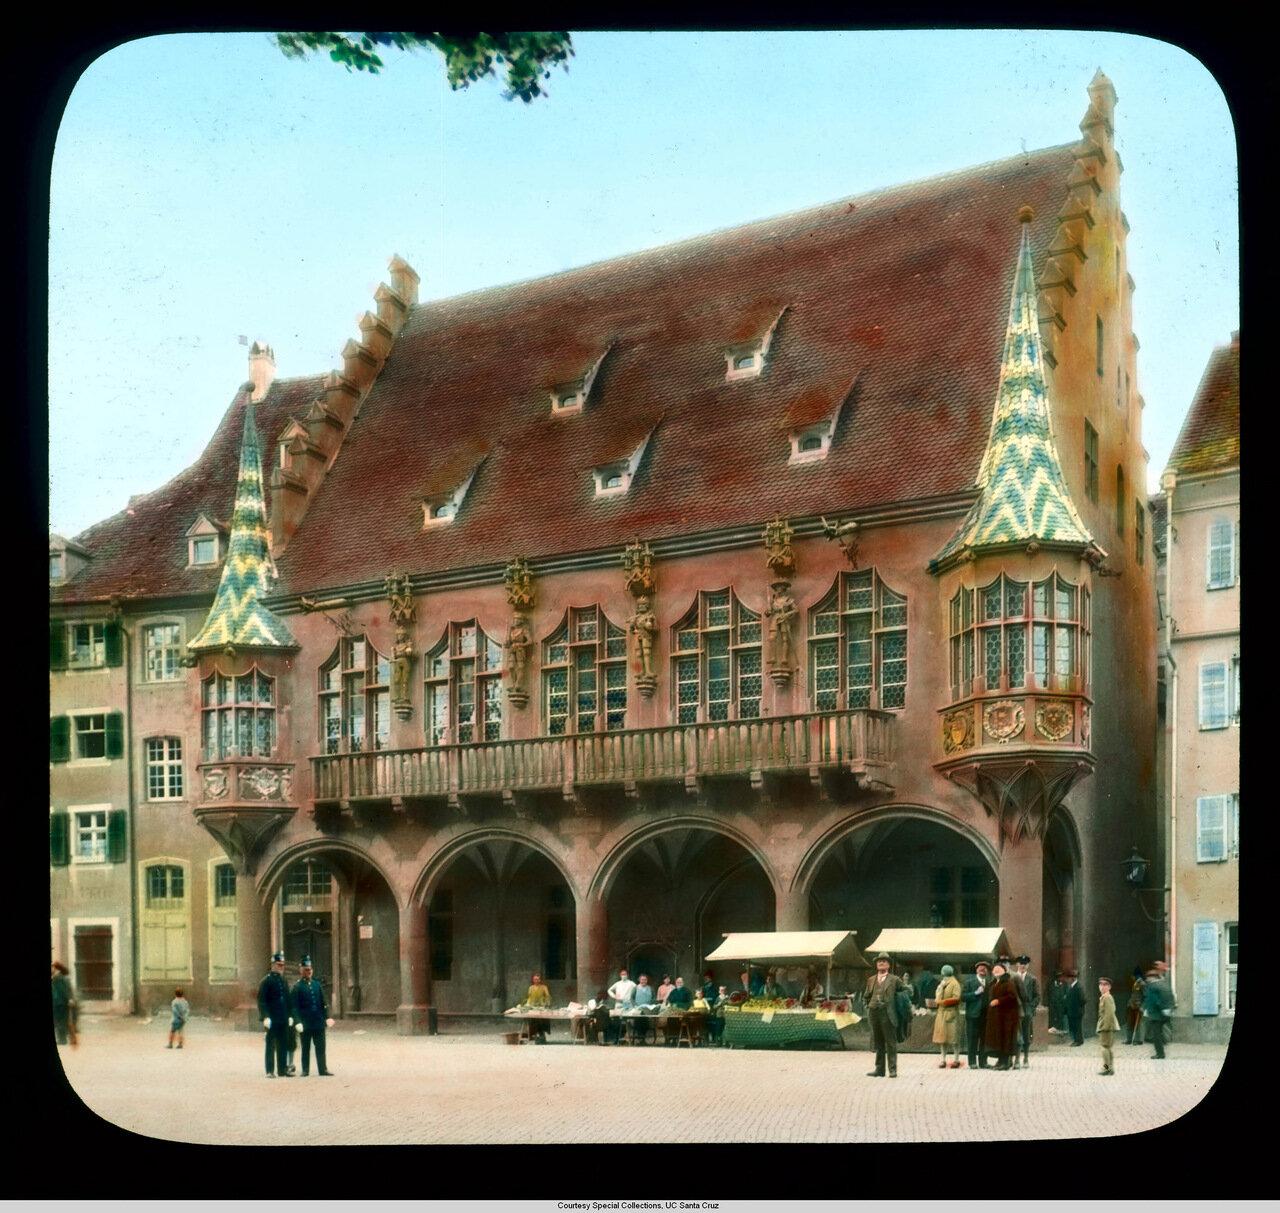 Фрайбург-в-Брайсгау. Фасад Исторического Зала Торговцев